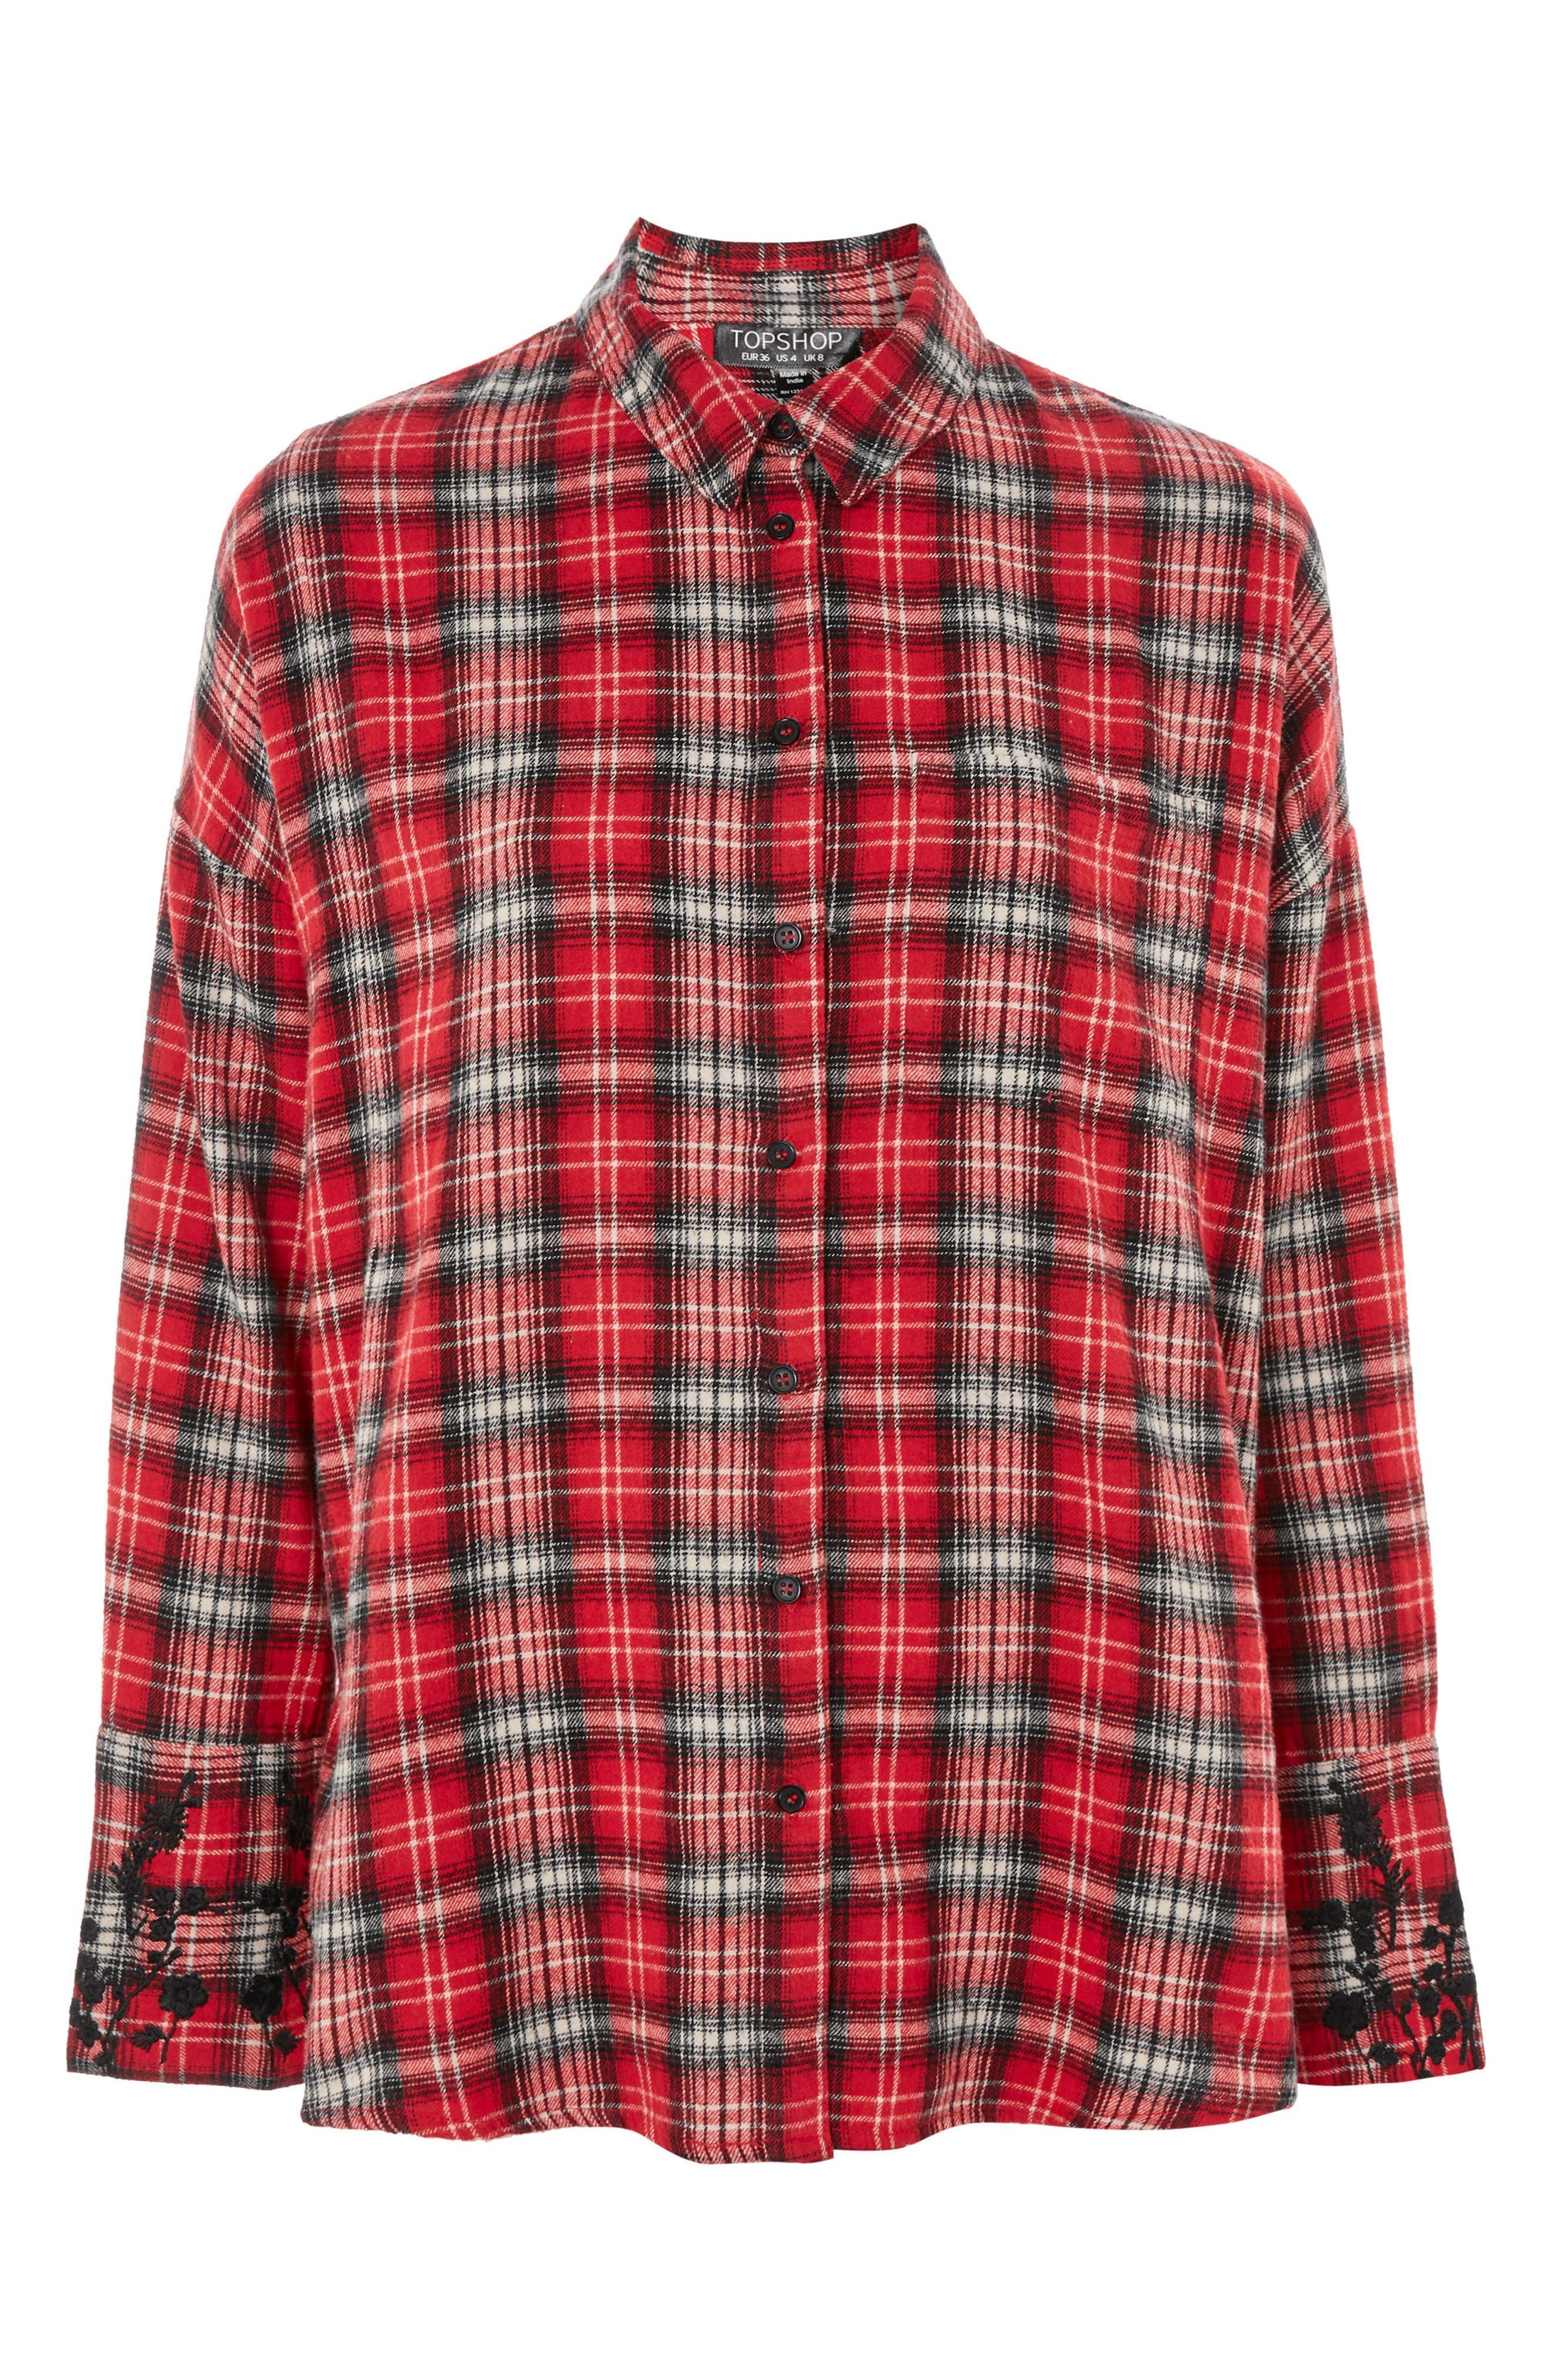 Falling Floral Plaid Shirt,                             Alternate thumbnail 4, color,                             Red Multi